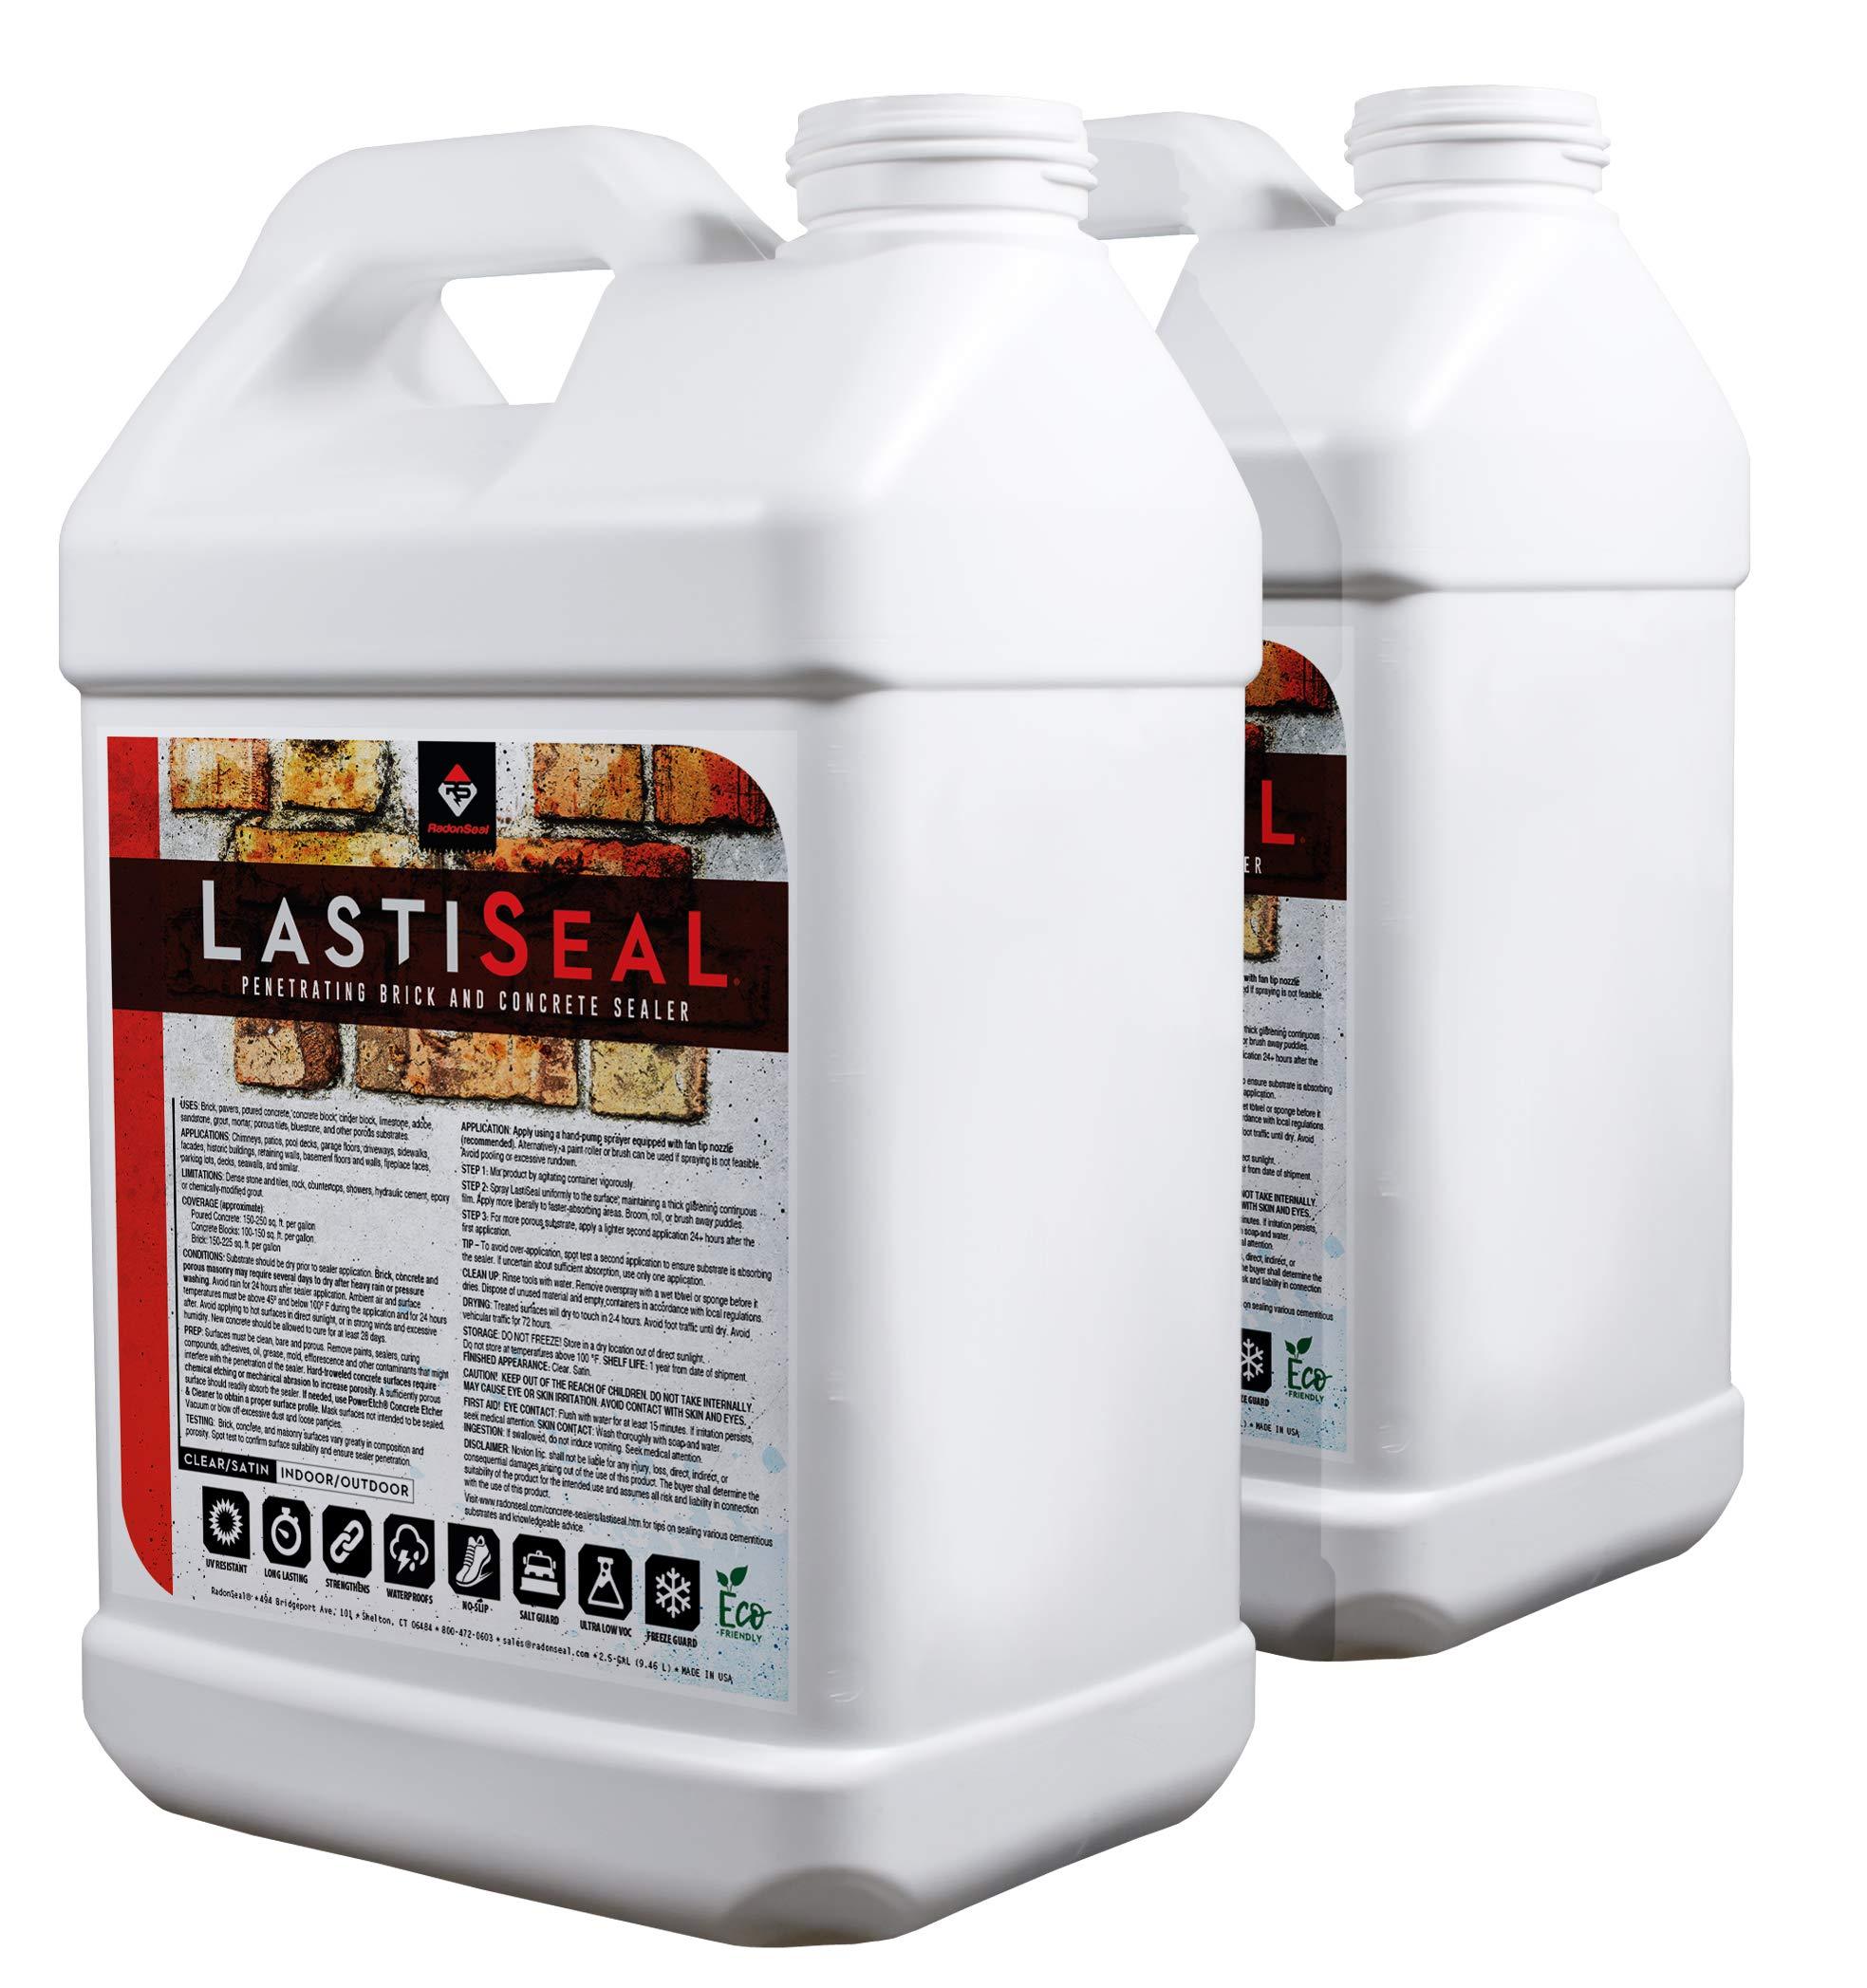 LastiSeal Brick & Concrete Sealer - SATIN Finish (5-gal) | All Purpose Sealer for Brick, Concrete, Stone, Porous Masonry | 15-Year Waterproofing Warranty | Low Gloss Sheen by RadonSeal (Image #1)